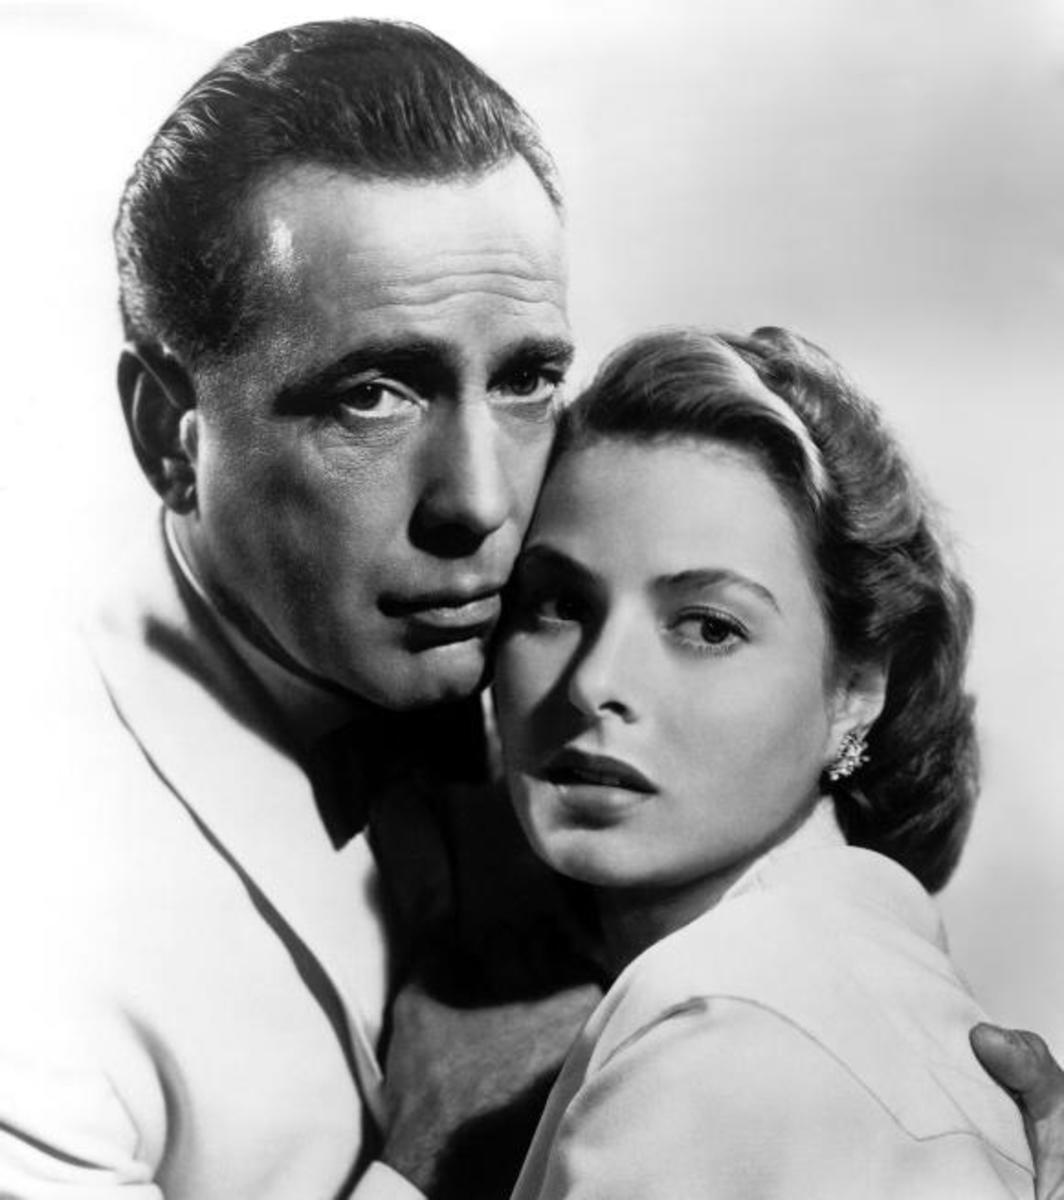 Humphrey Bogart with Ingrid Bergman